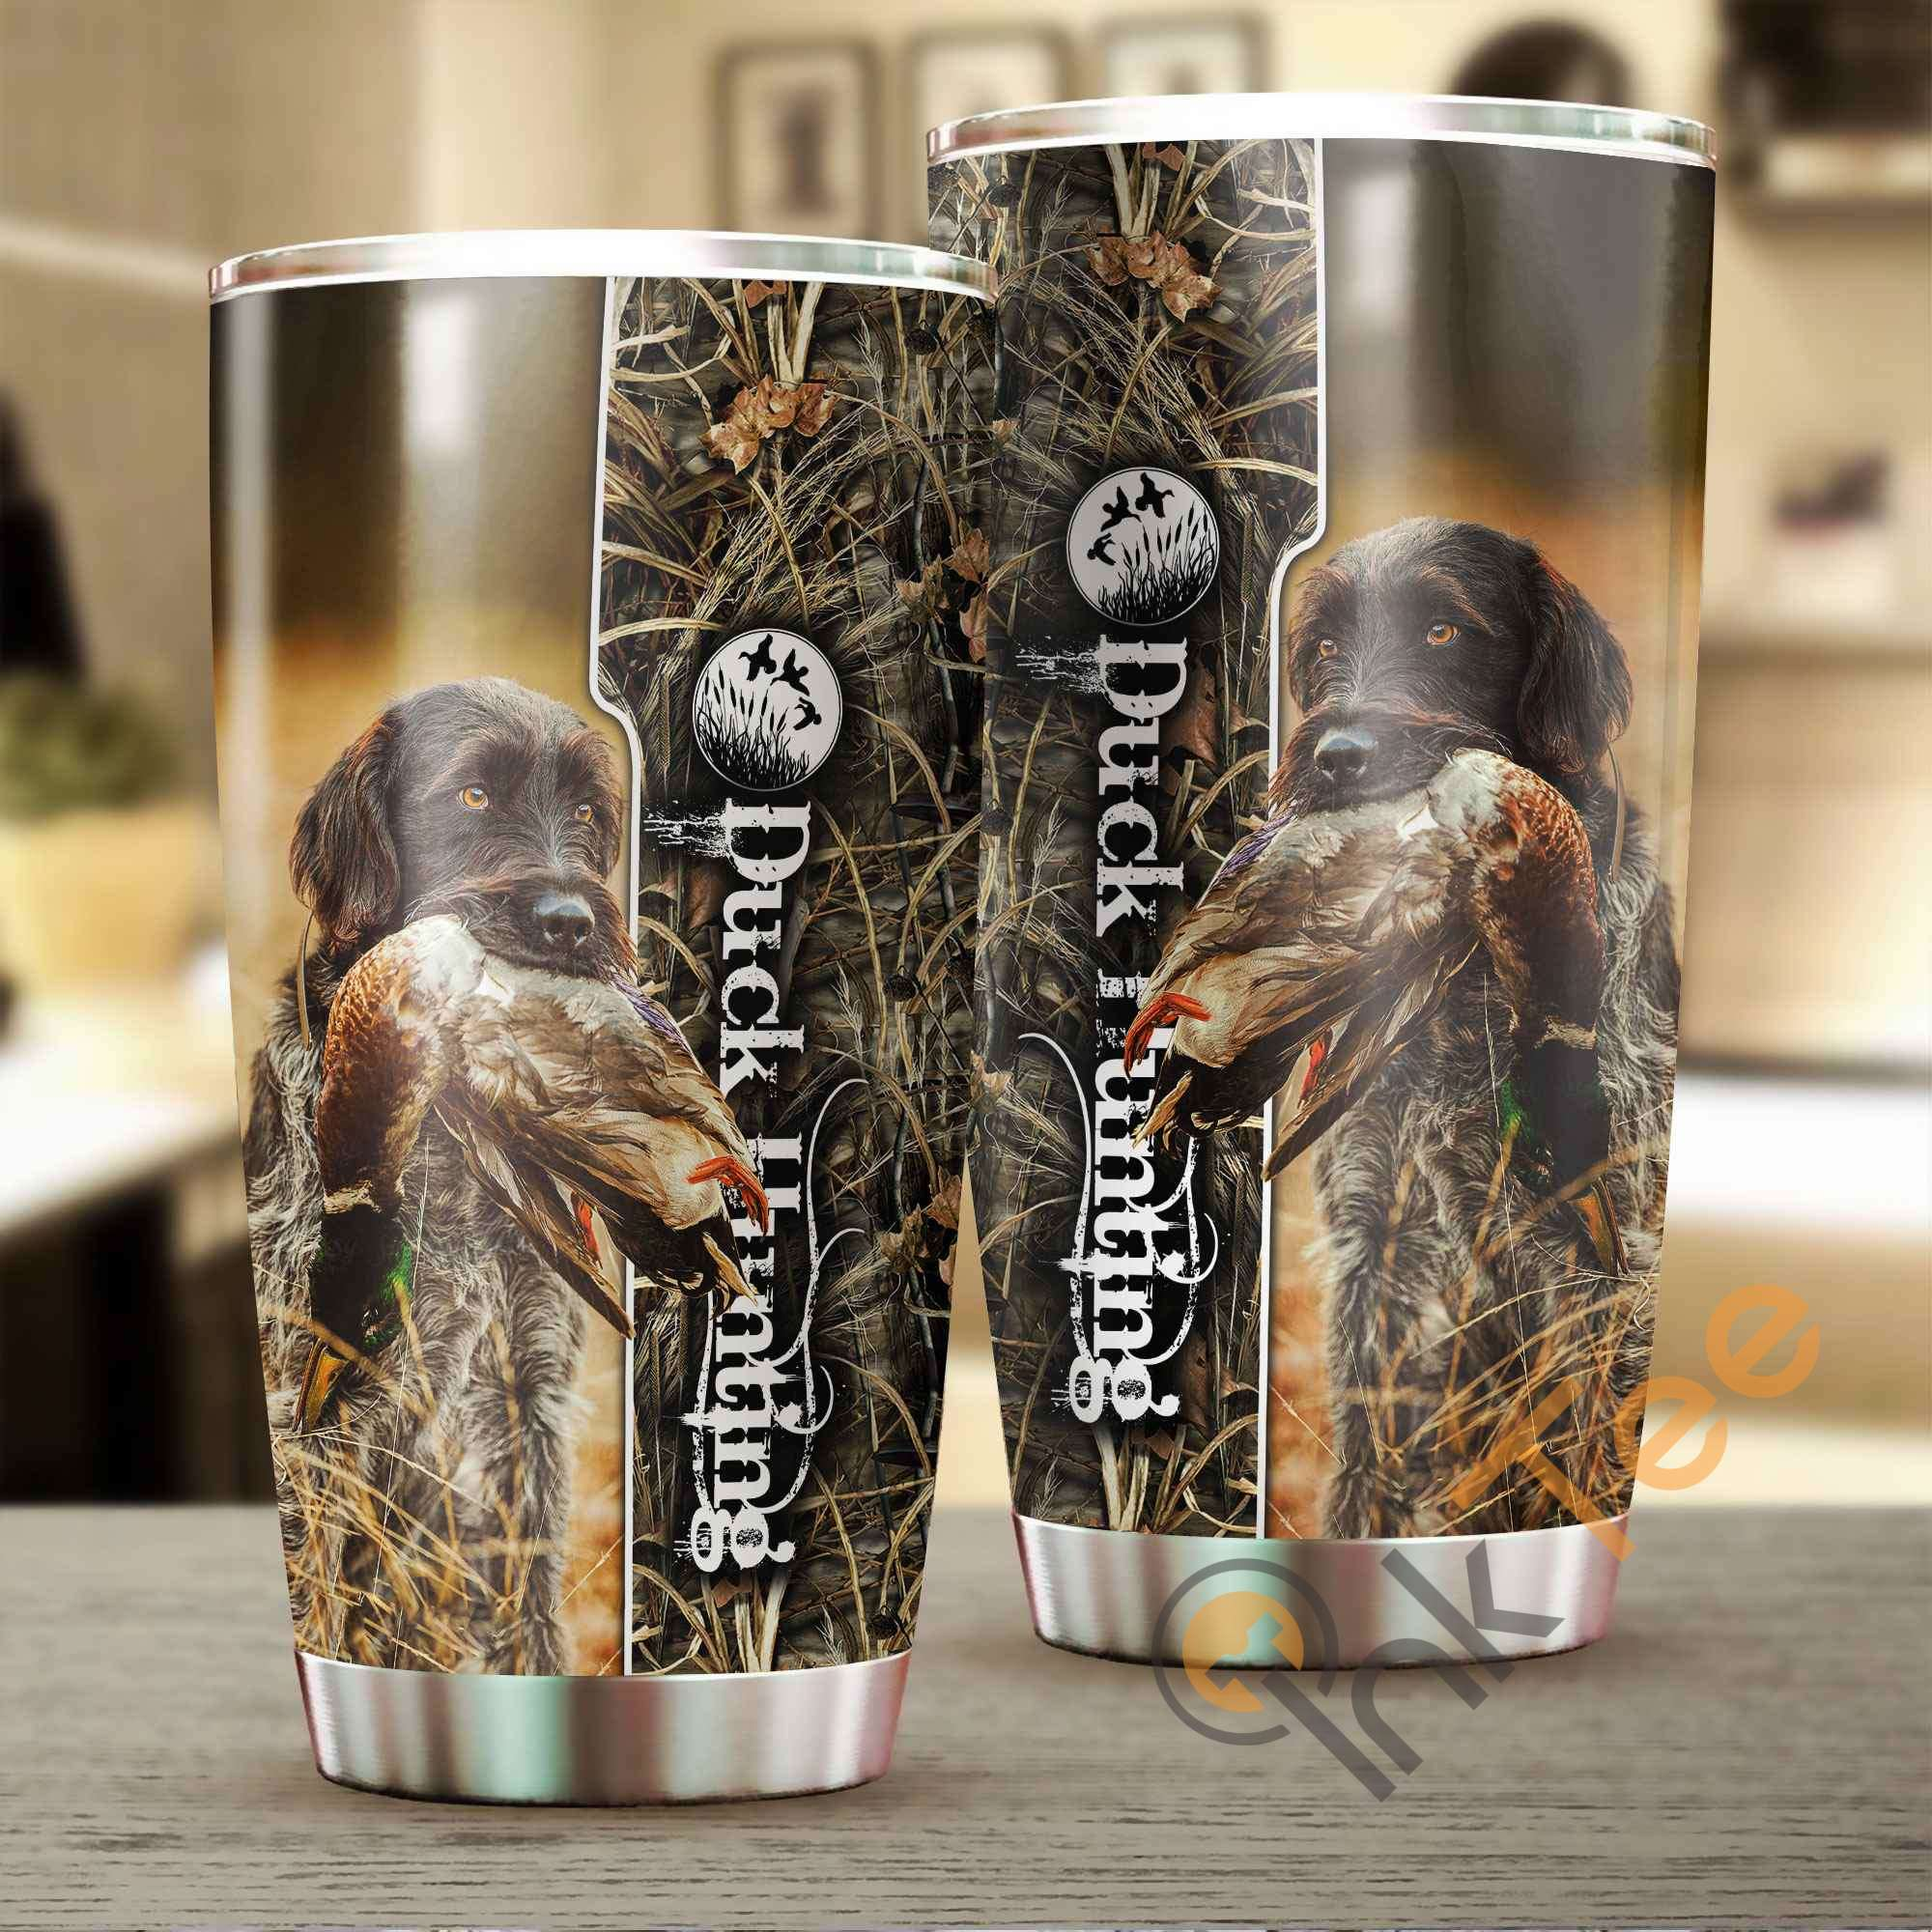 Duck Hunting Amazon Best Seller Sku 3321 Stainless Steel Tumbler